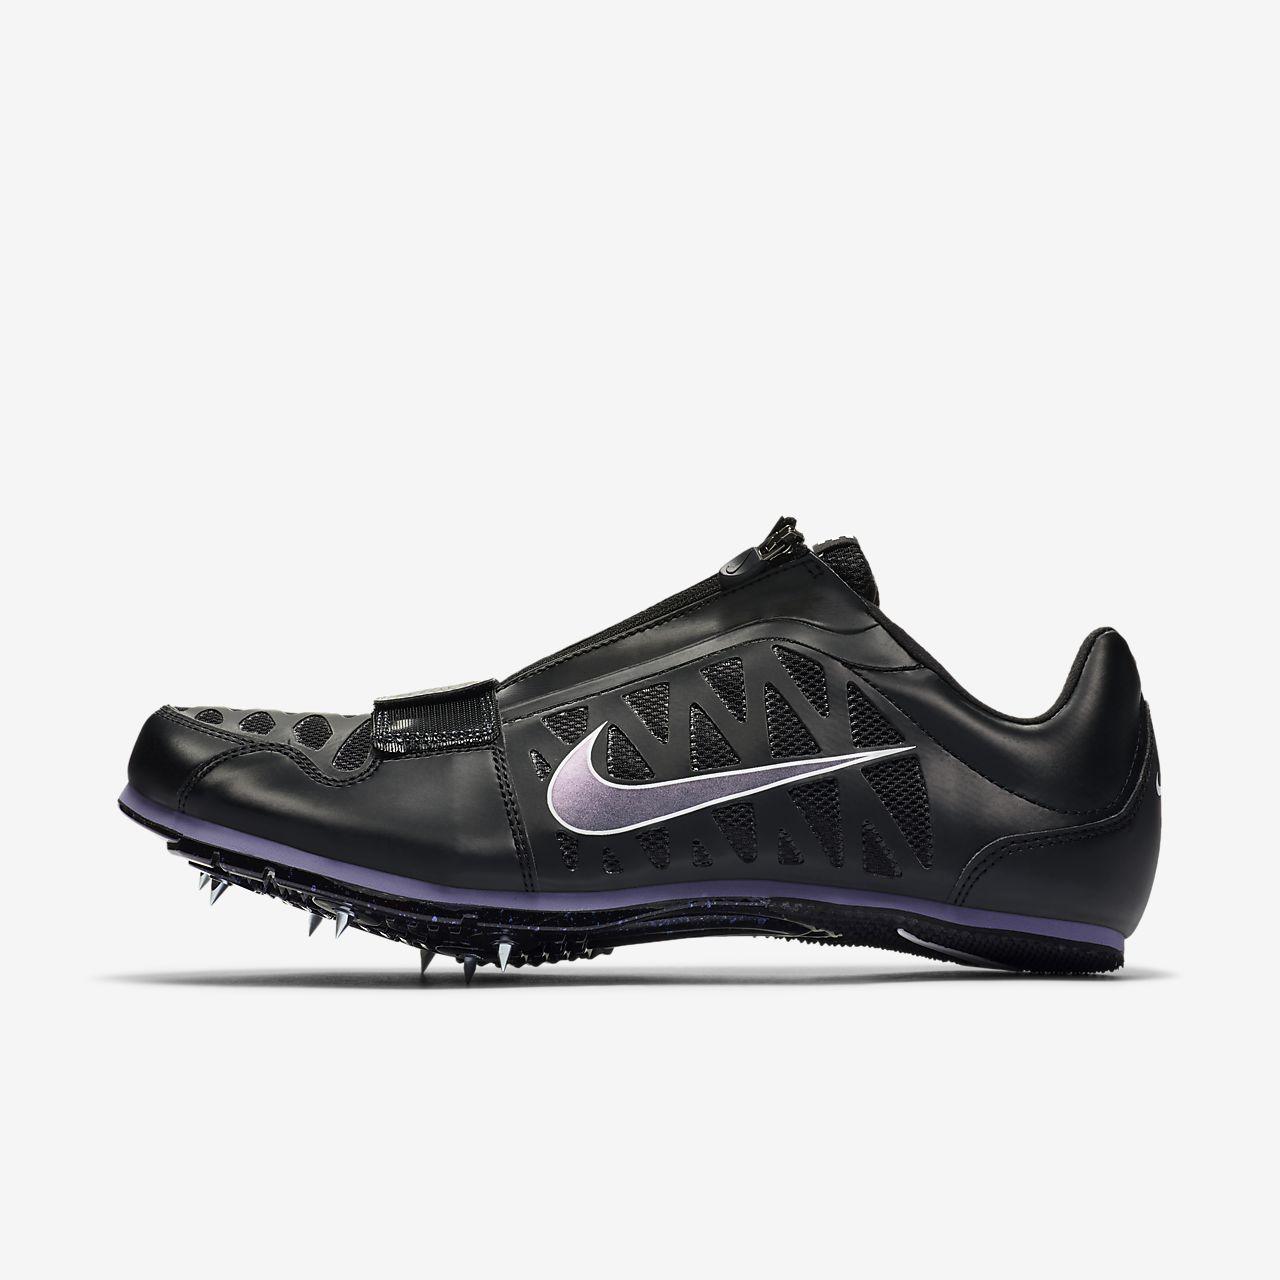 Scarpa chiodata per il salto Nike Zoom LJ 4 - Unisex